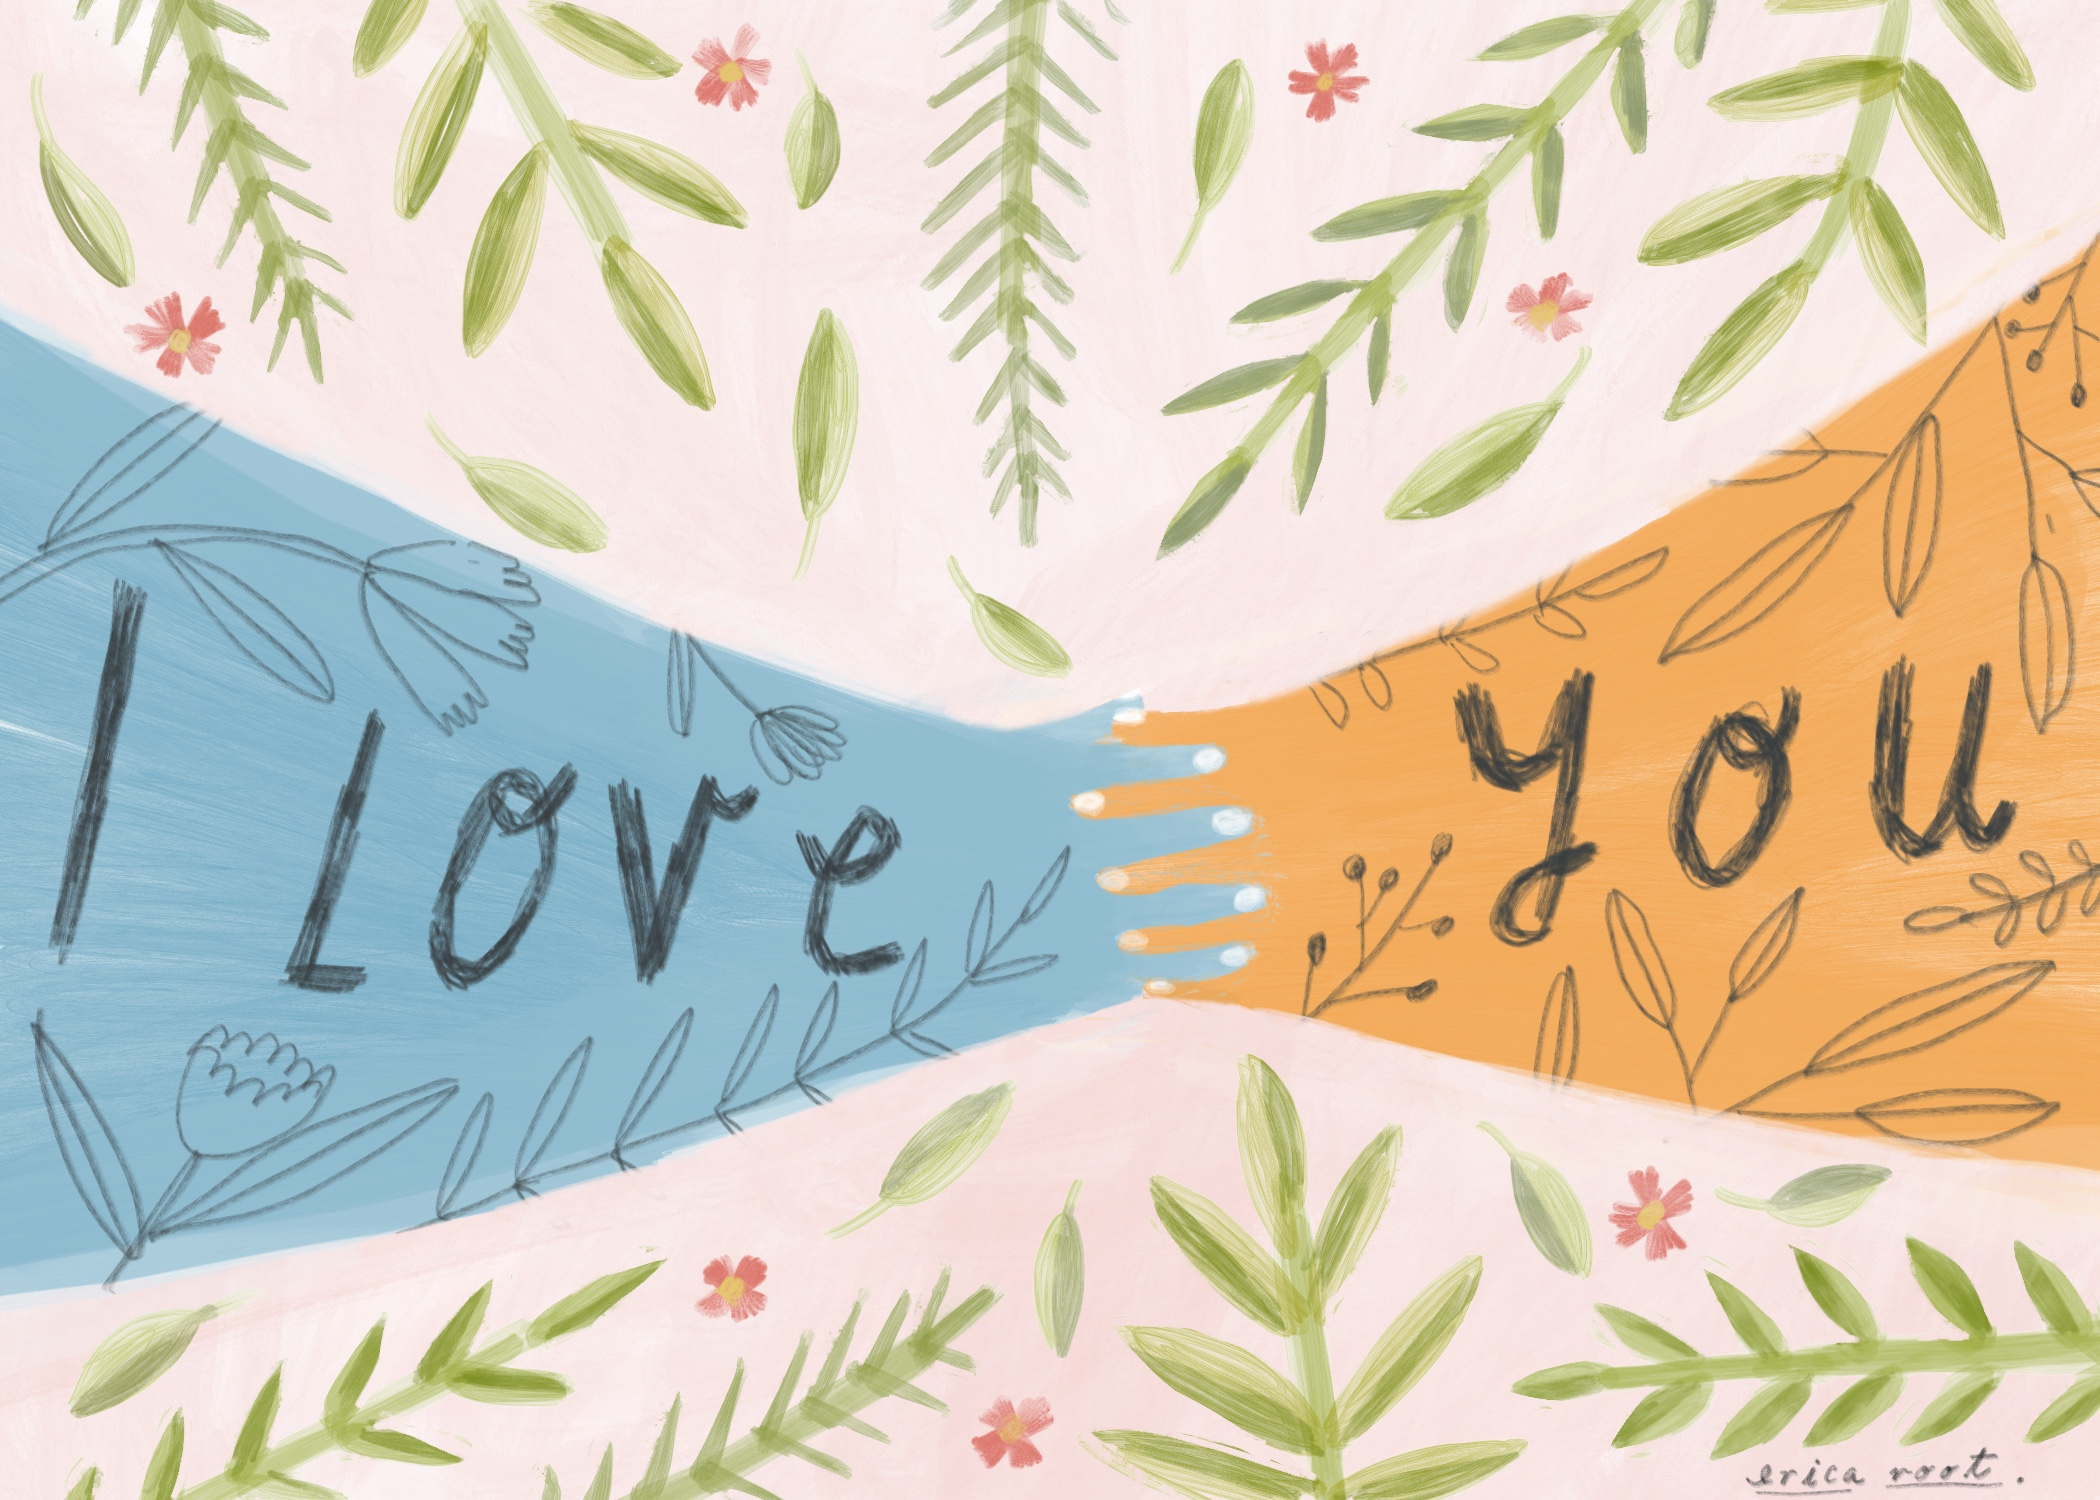 I_Love_You_Hands_Card.jpg